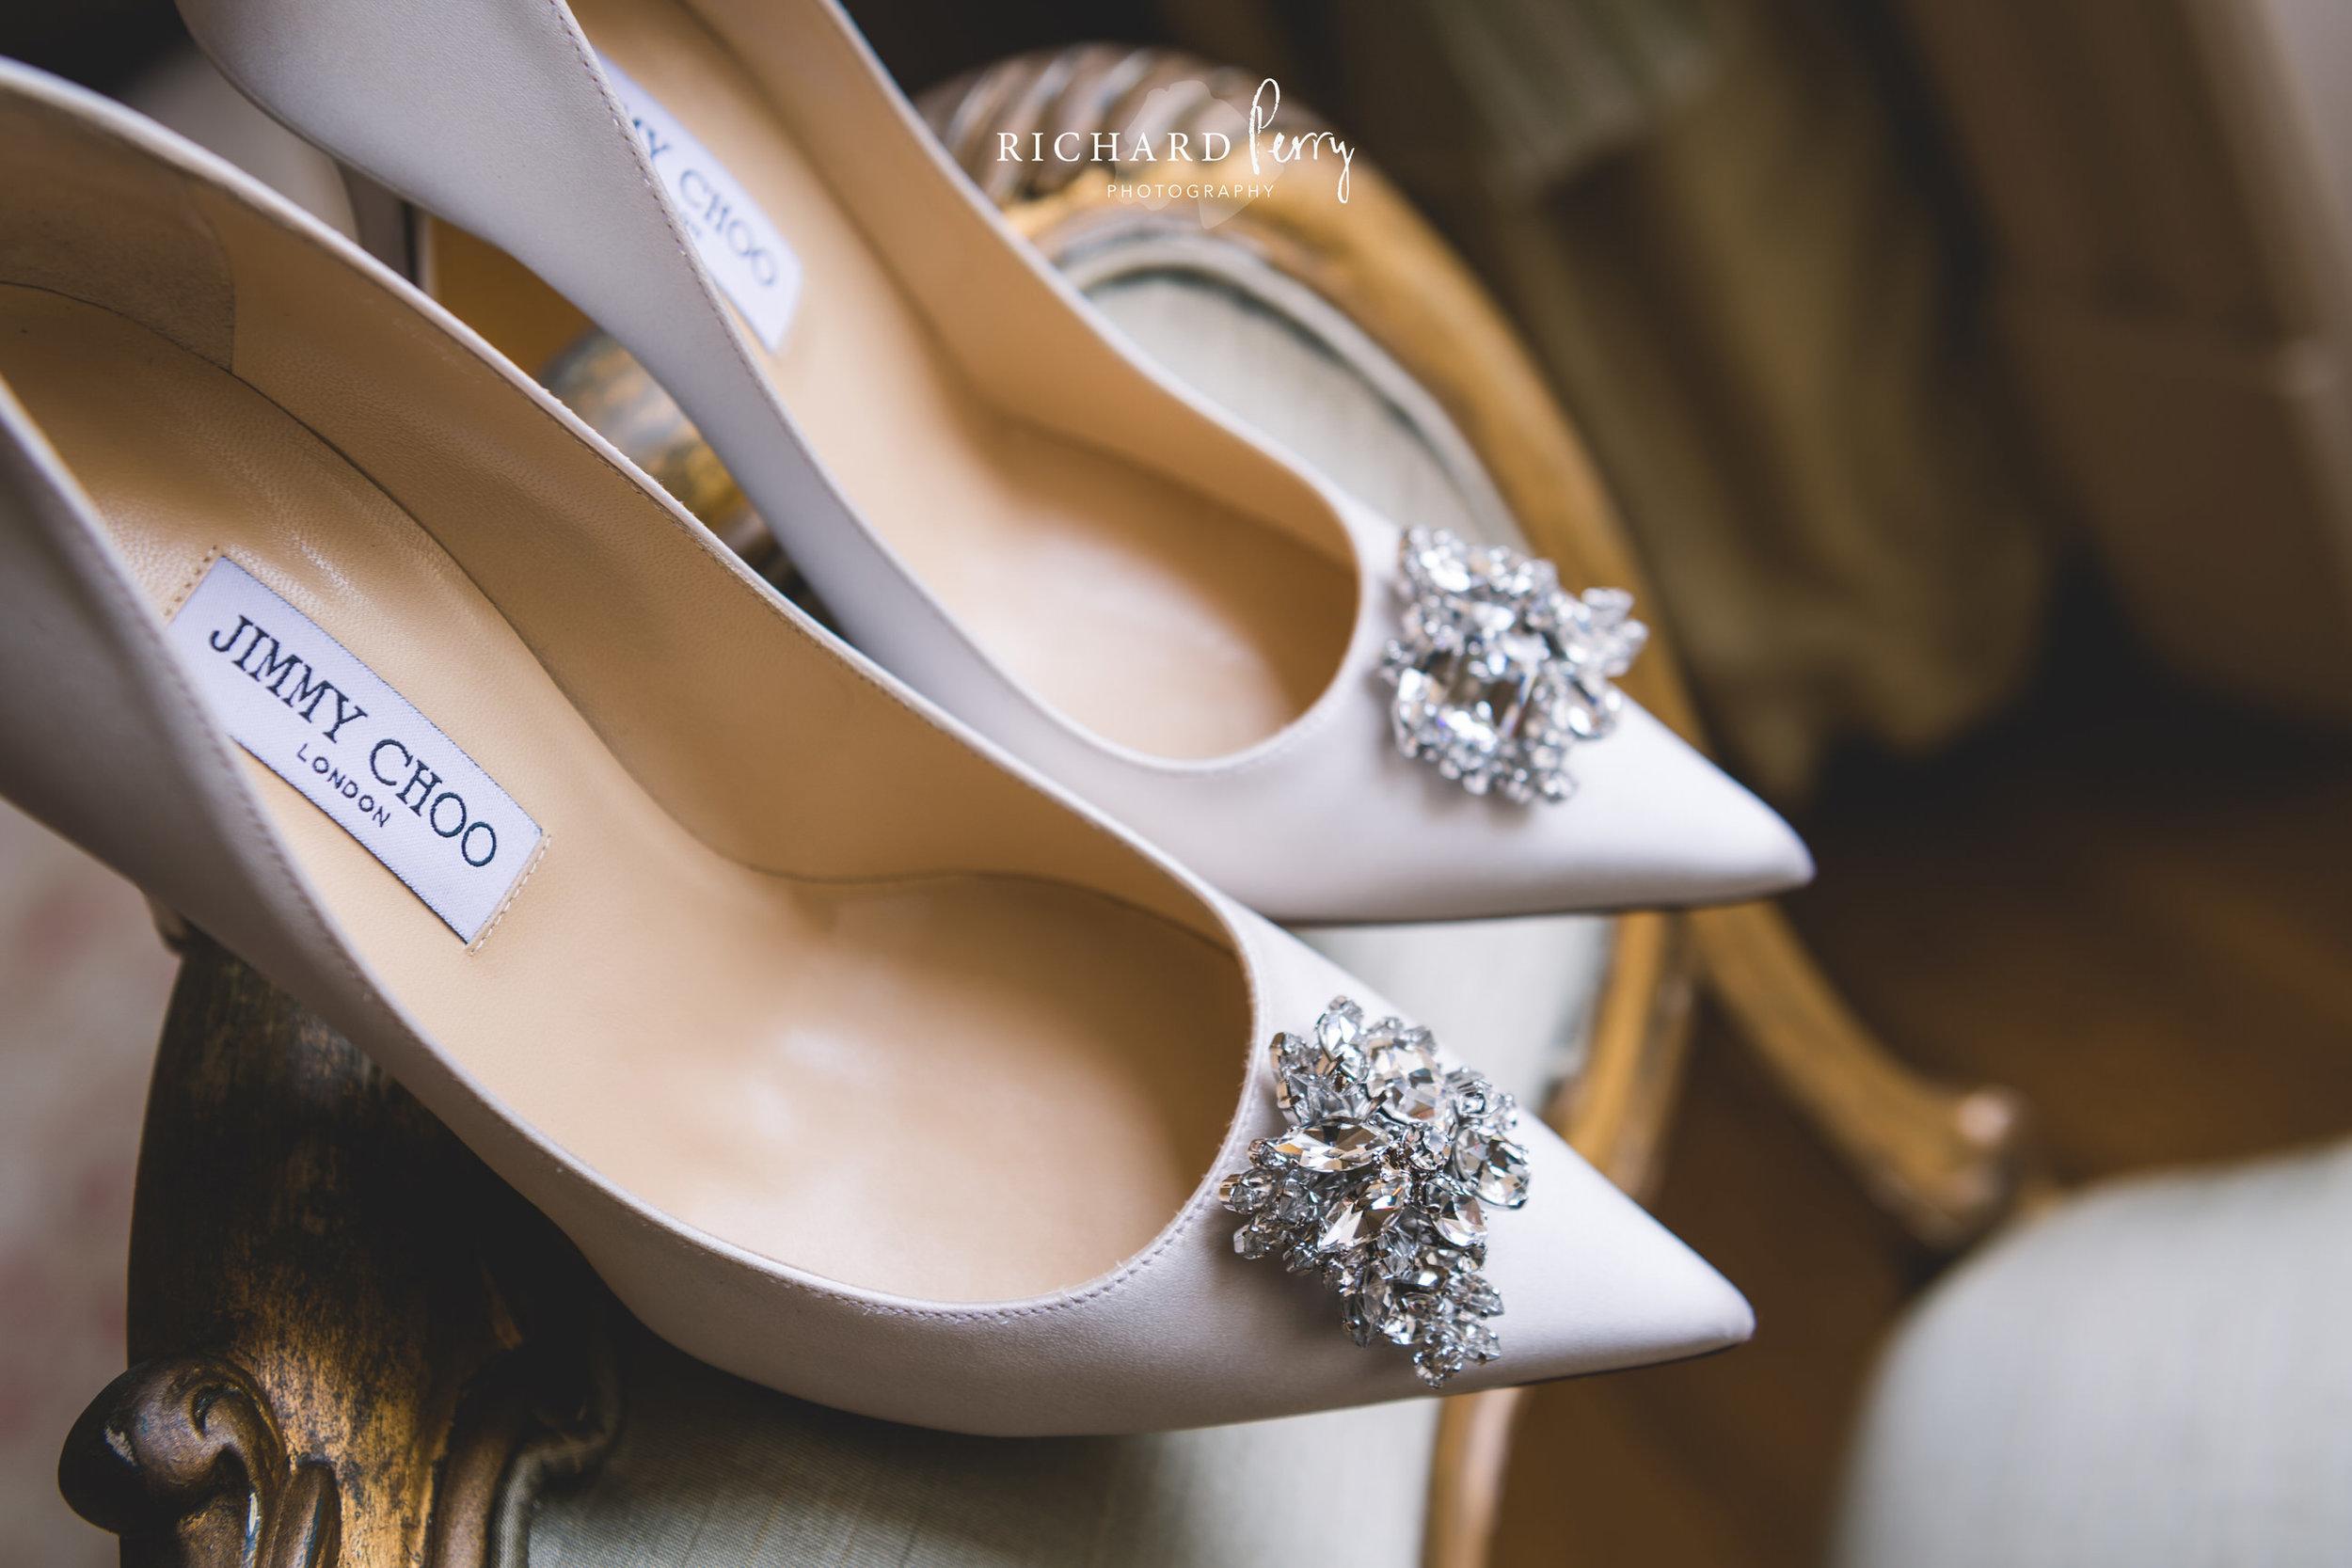 yorkshire-wedding-photographer-destination-archerfield-house-5.jpg